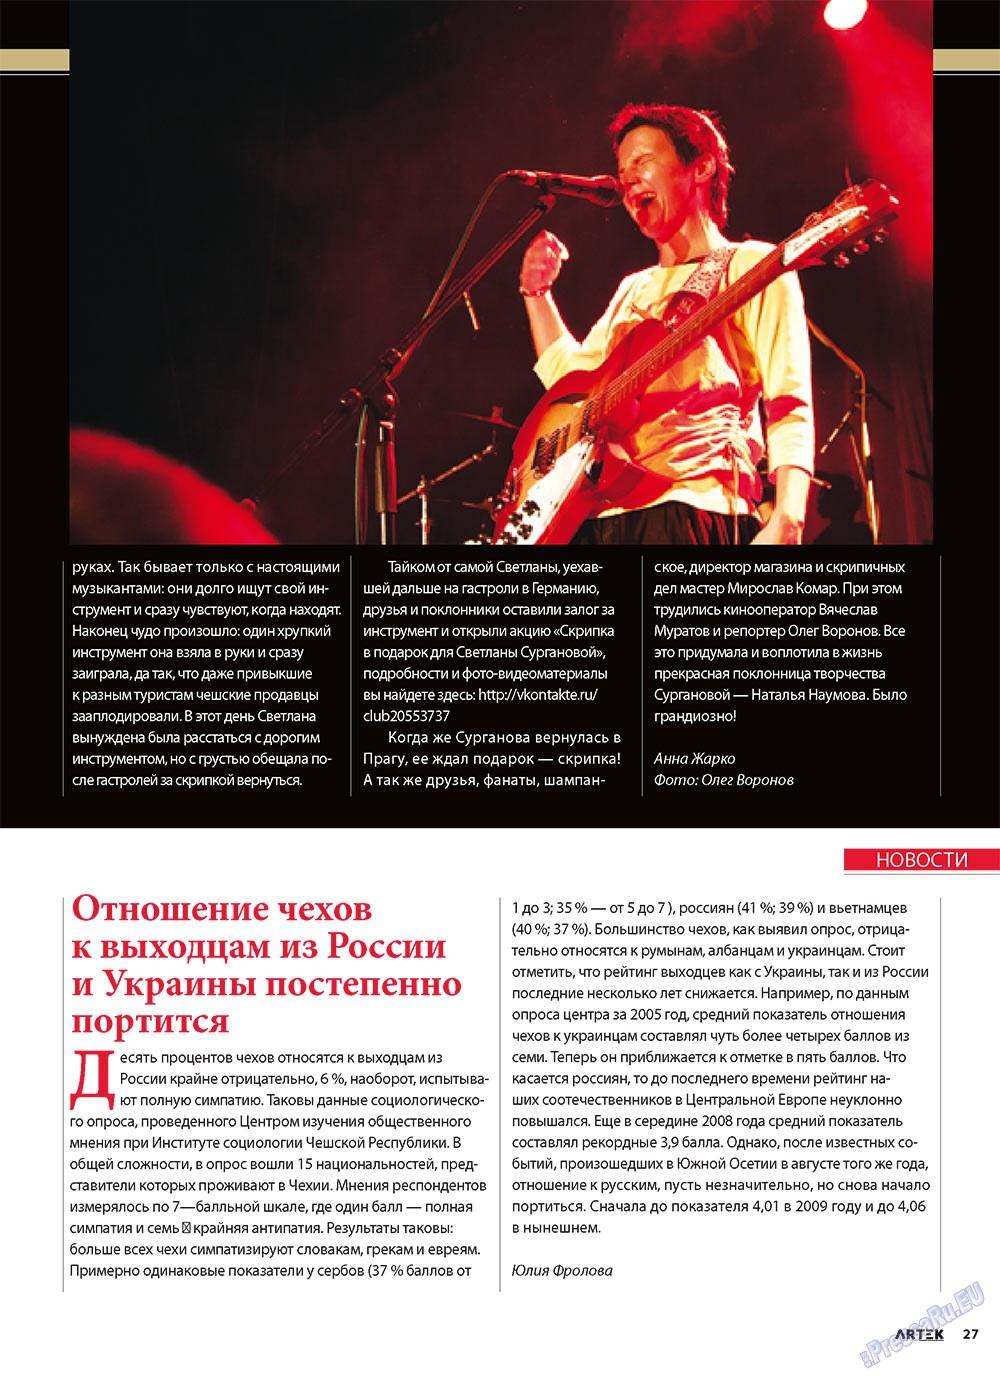 Артек (журнал). 2010 год, номер 5, стр. 29